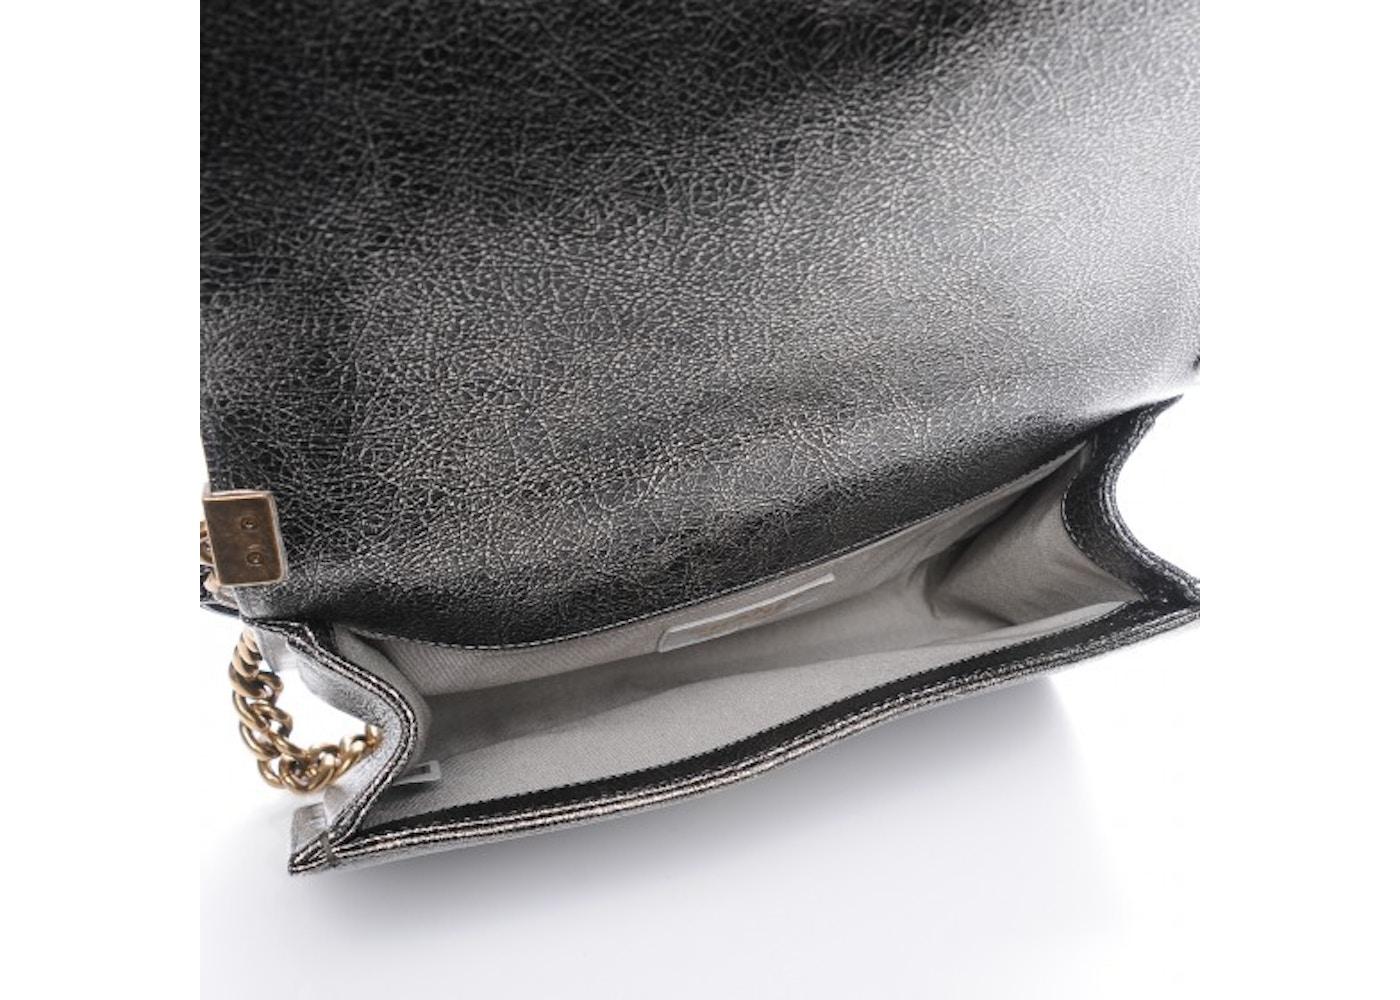 3efce58700d4 Chanel Boy Flap Quilted Diamond Cracked Metallic Calfskin Medium Silver